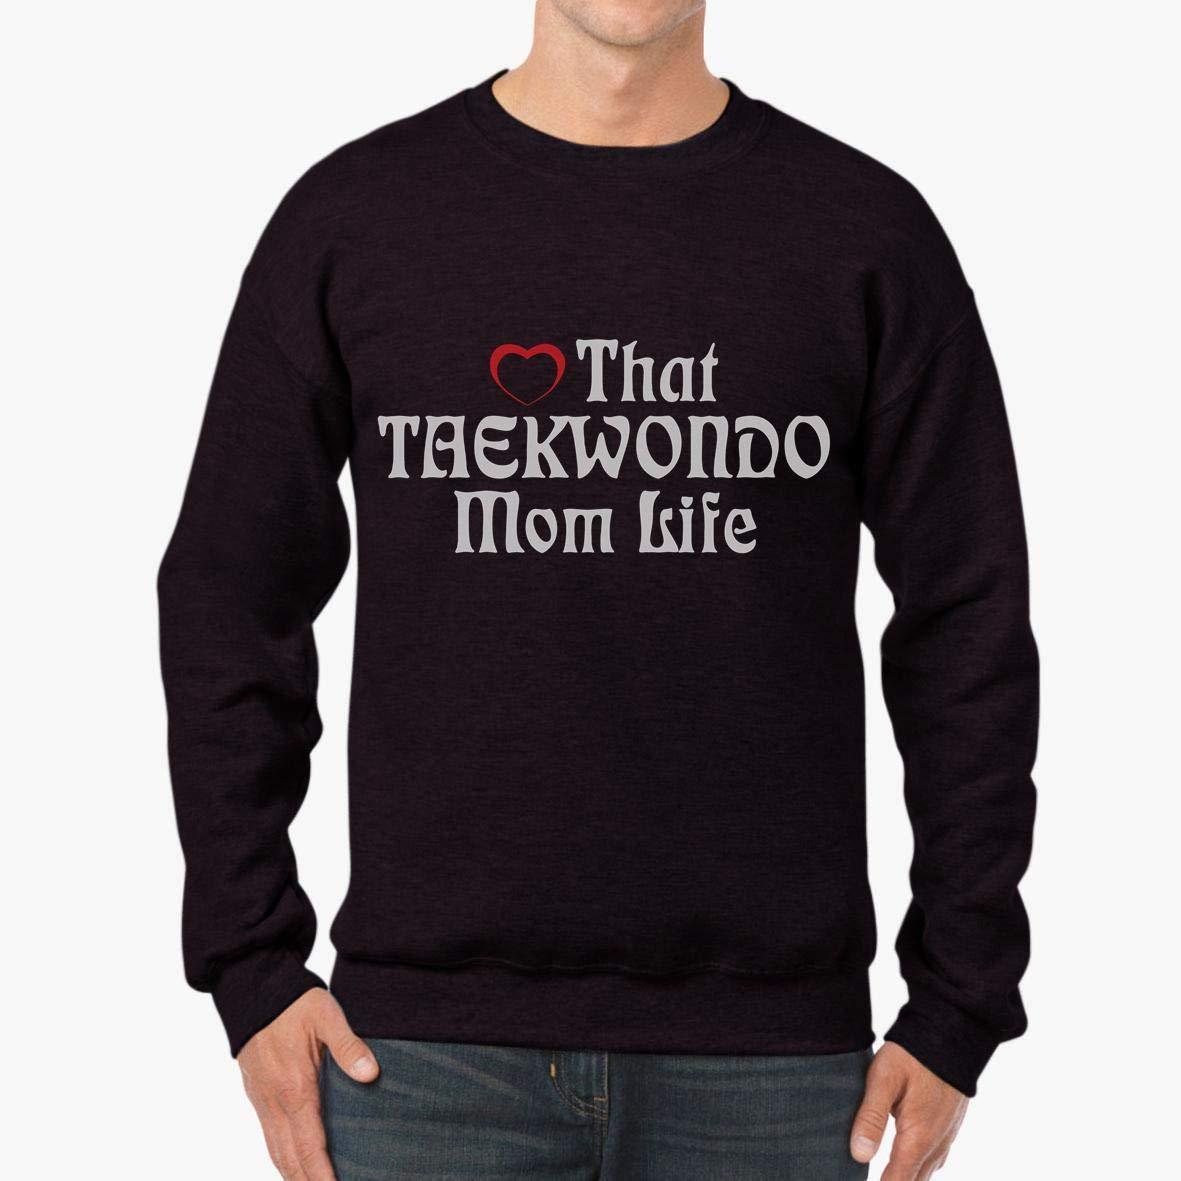 Doryti Heart That Taekwondo Mom Life Unisex Sweatshirt tee